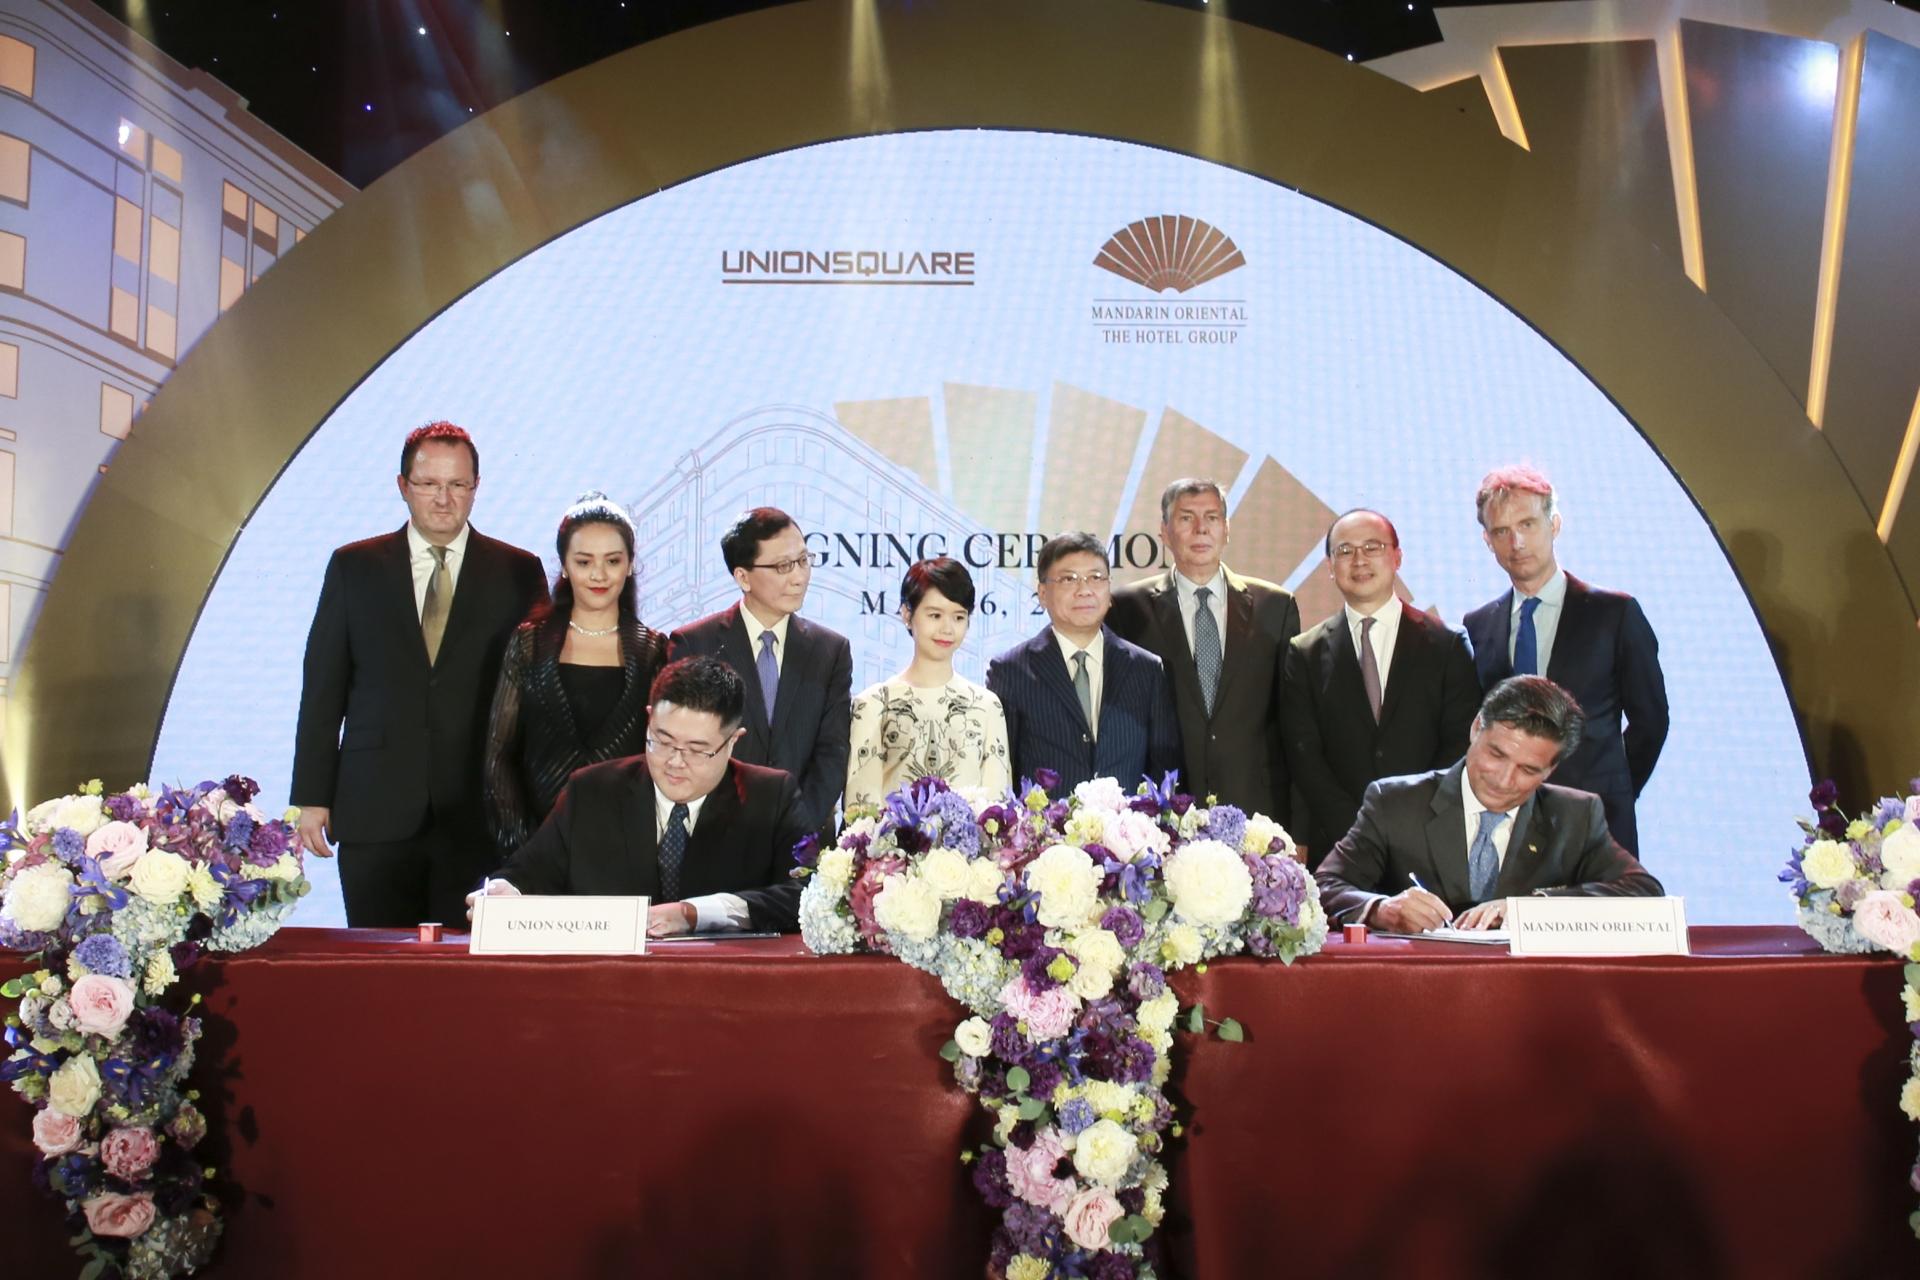 Mandarin Oriental unveils its first five-star hotel project in Vietnam